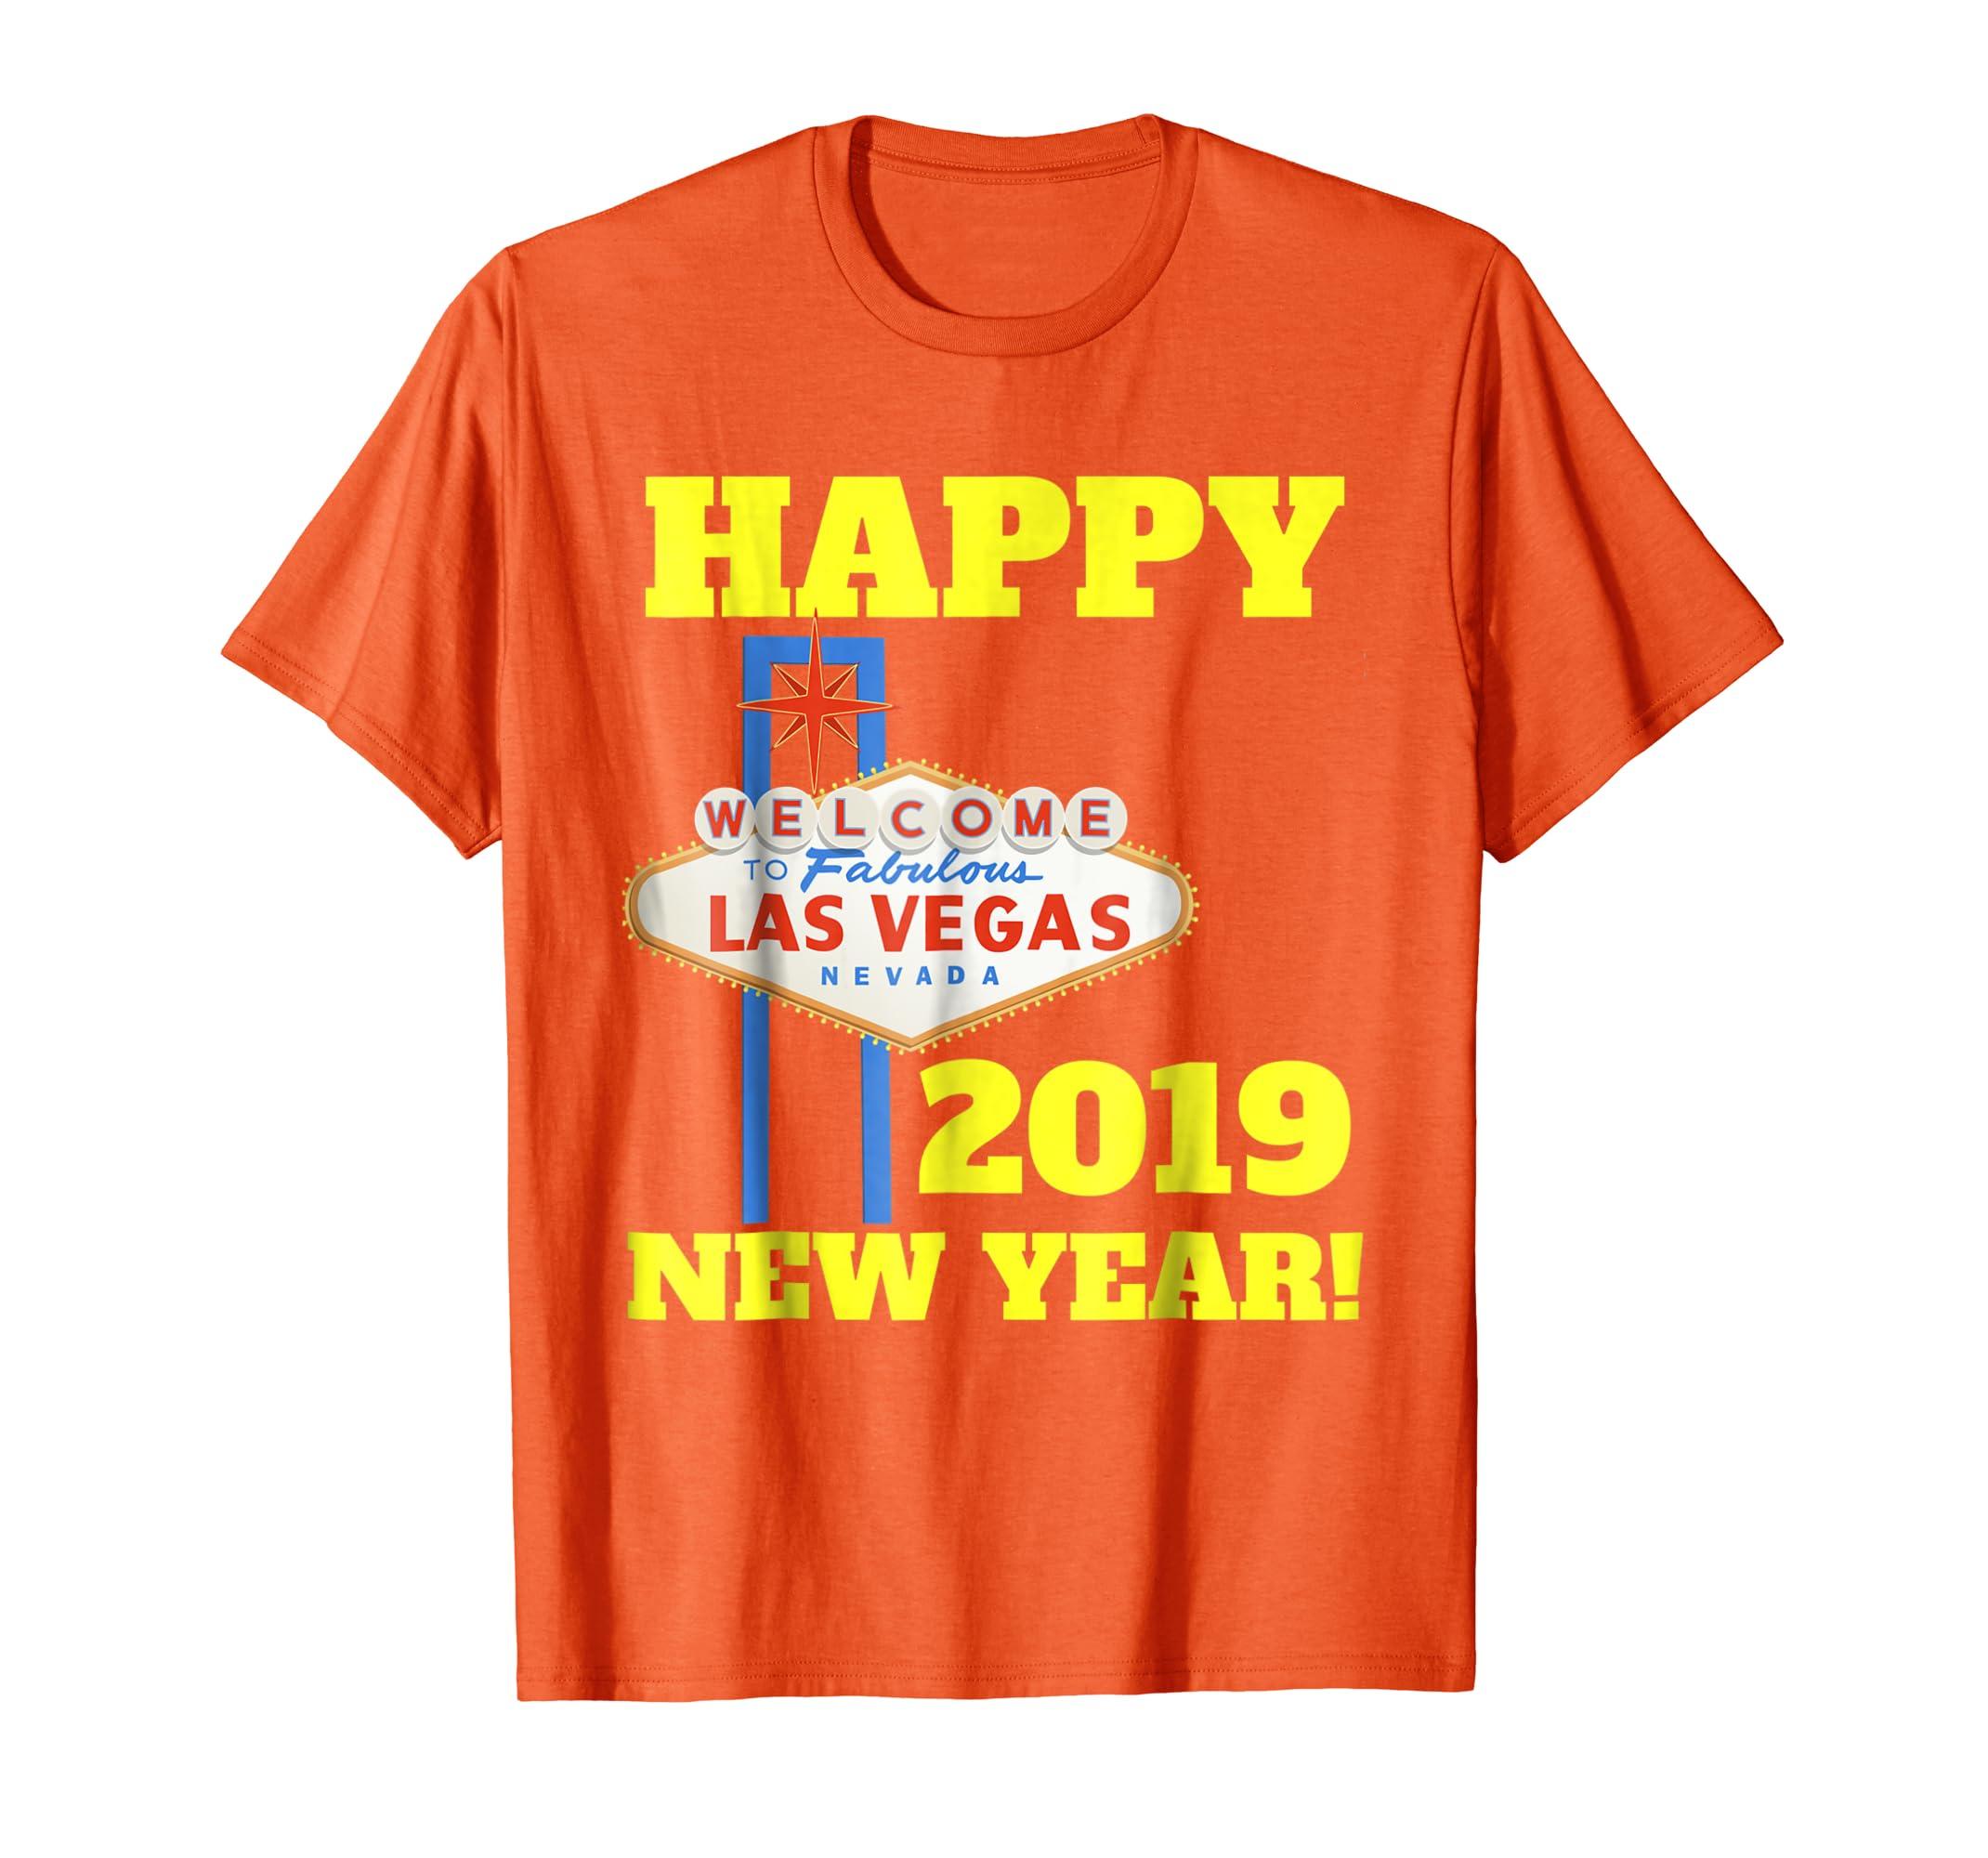 1a3b691d Las Vegas New Years 2019 Shirt, Happy New Year Vegas 2019-azvn ...